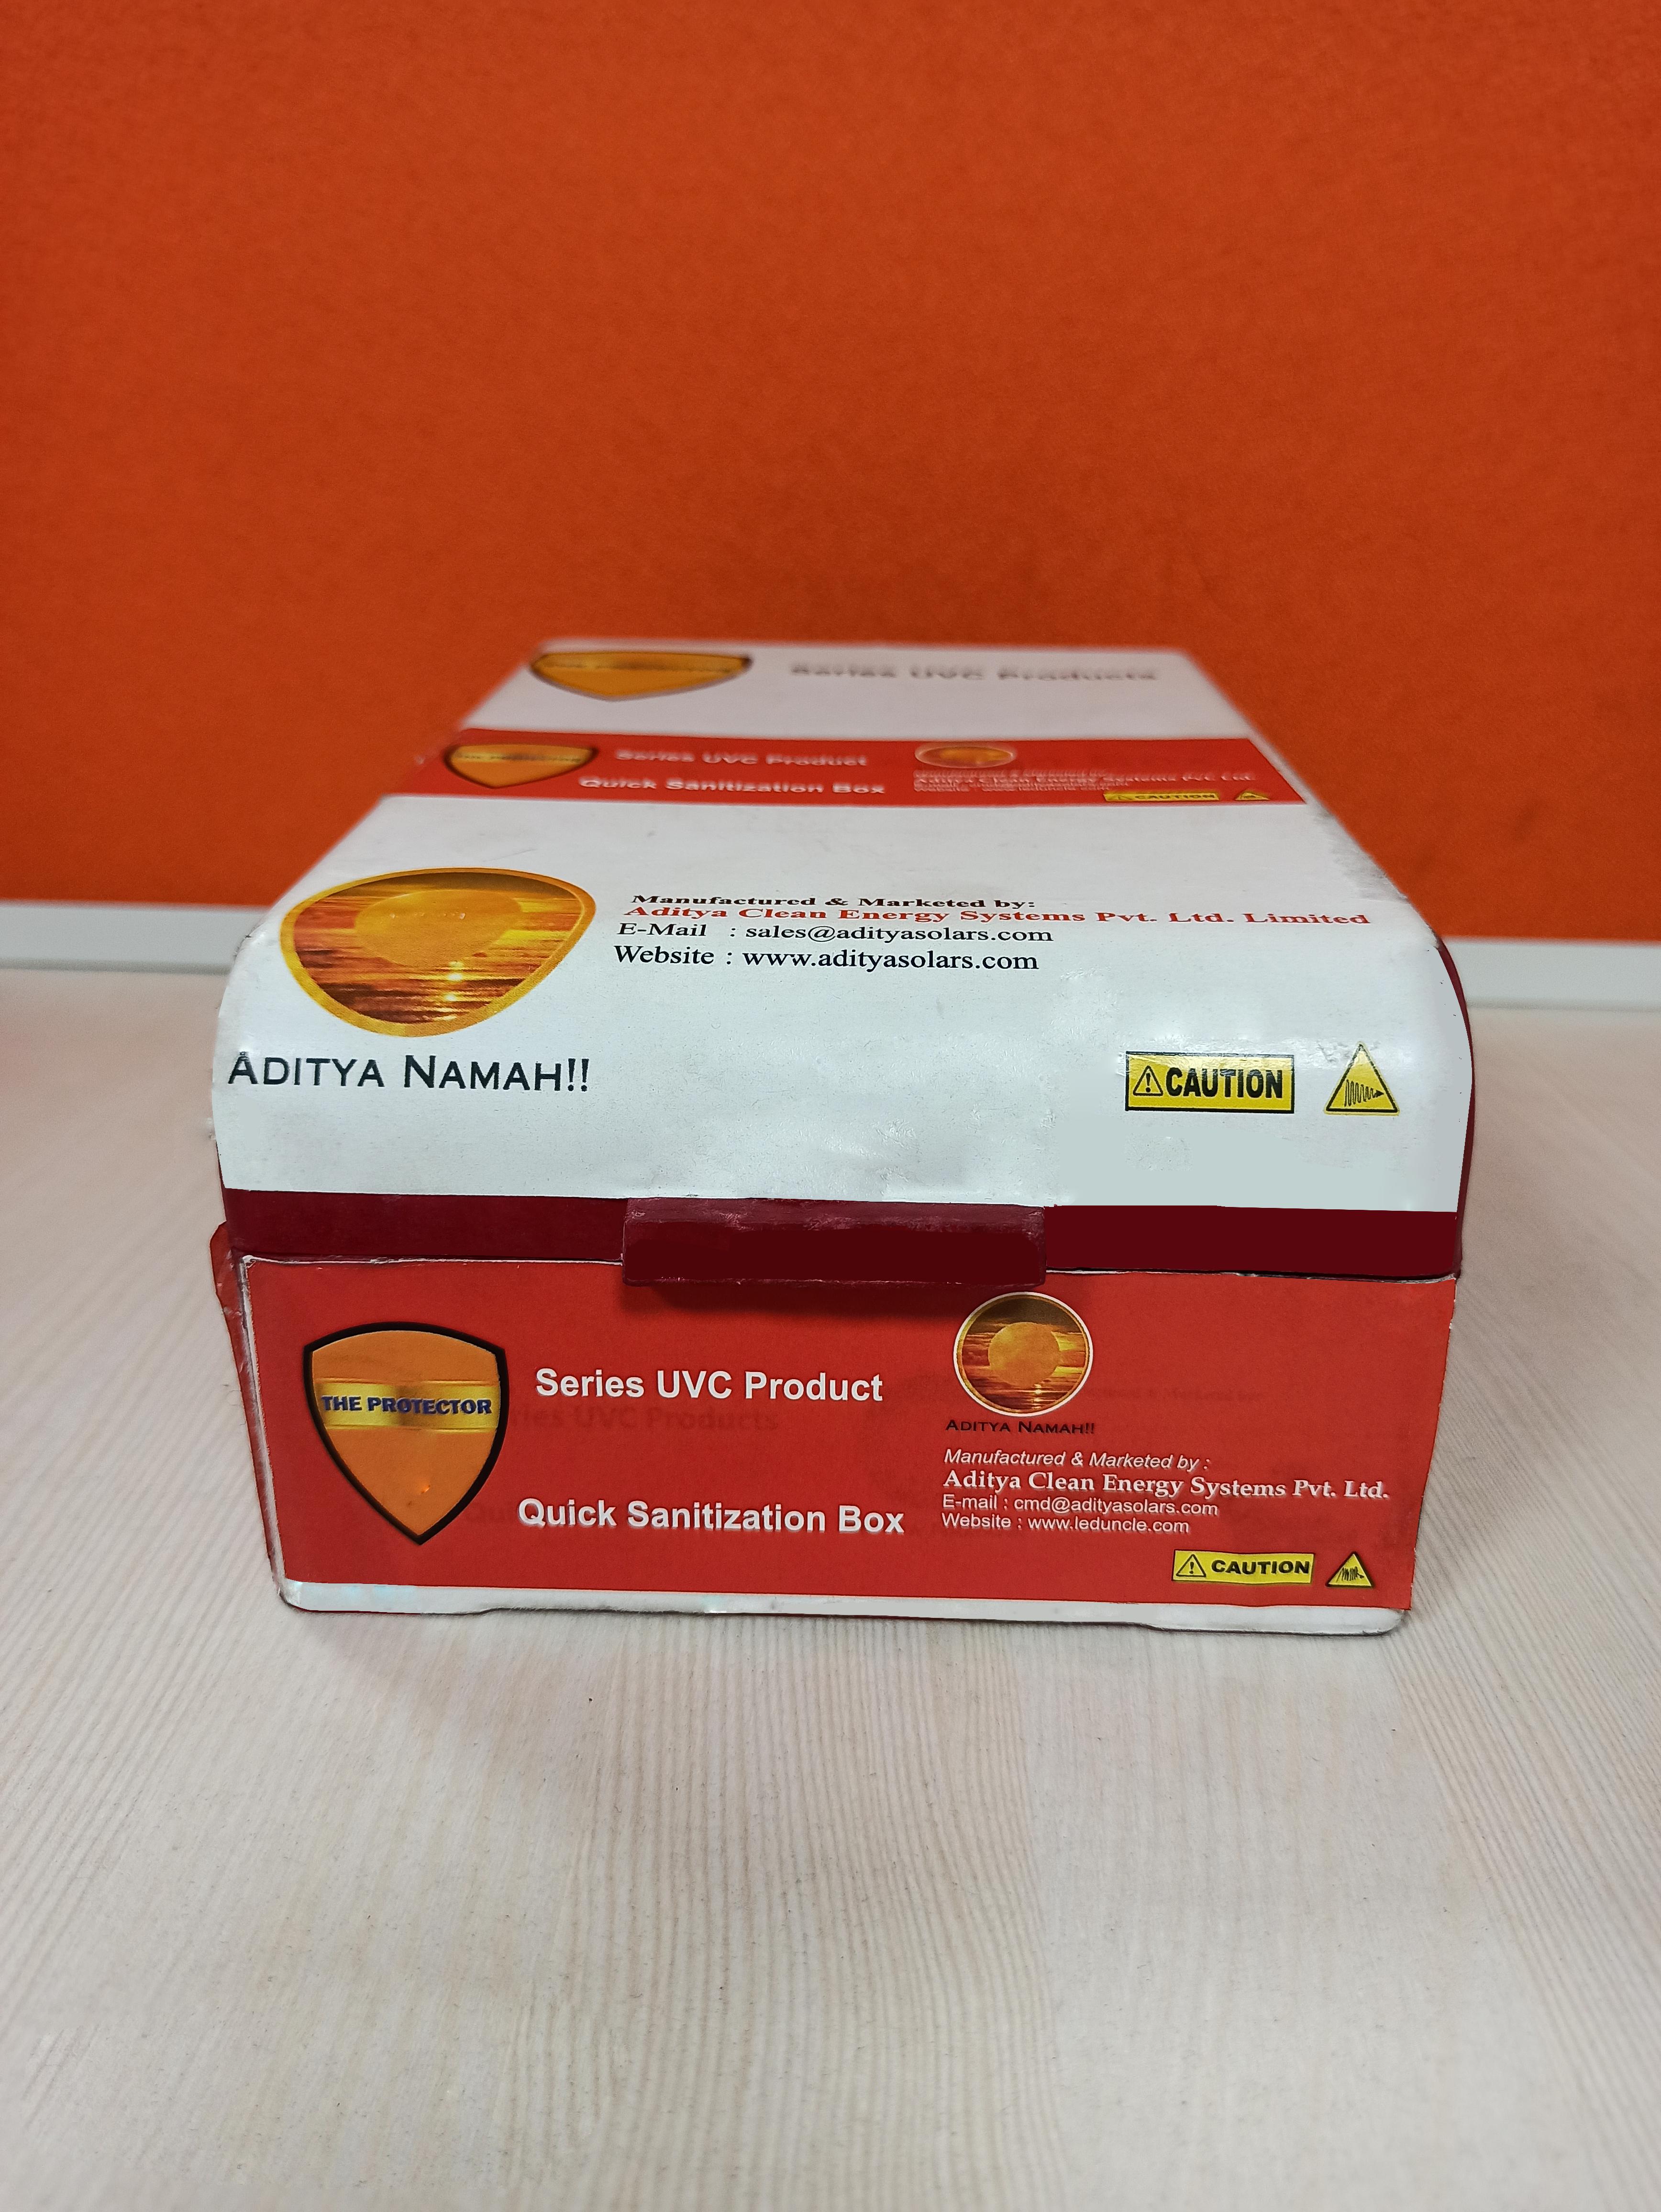 UVC Disinfection Box